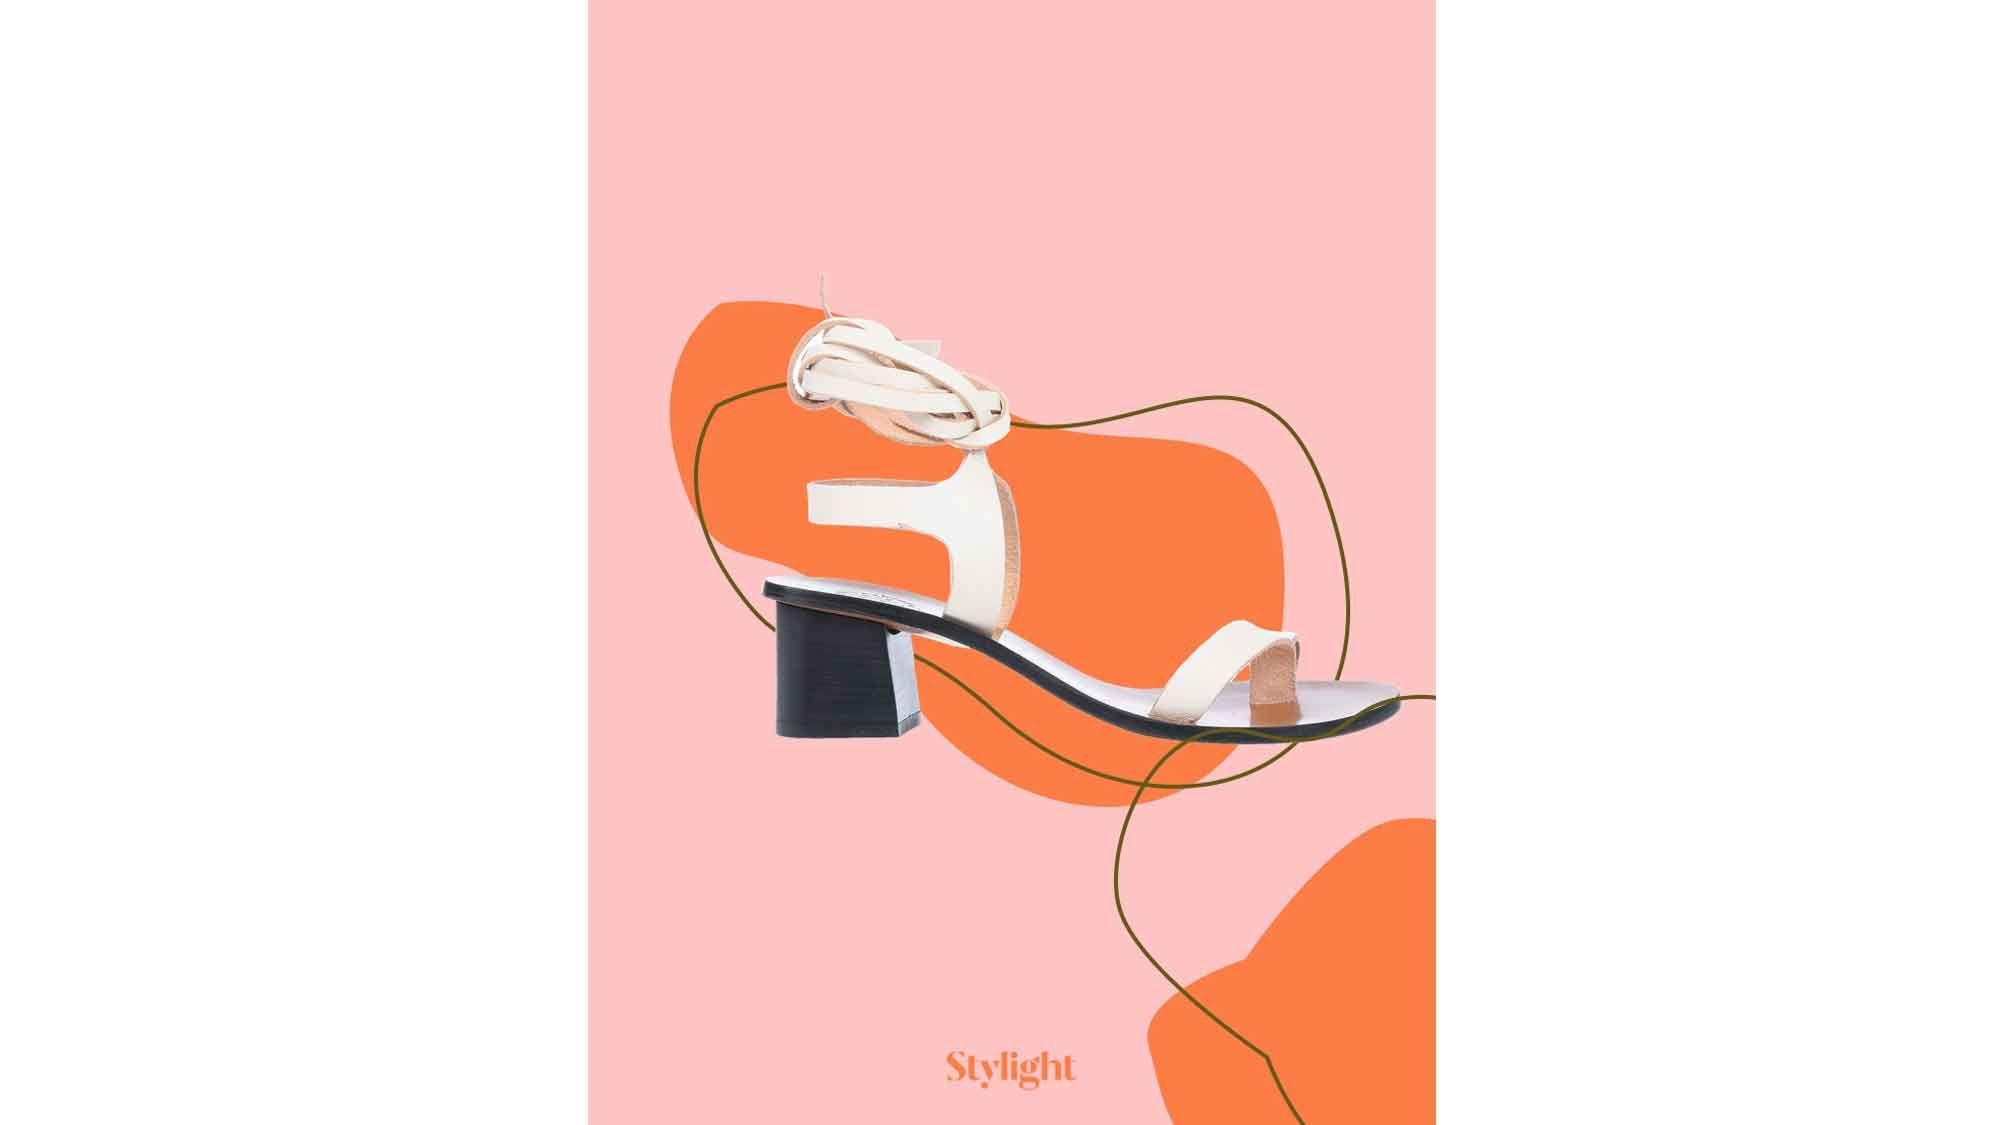 stylight-sandalengebunden.jpg